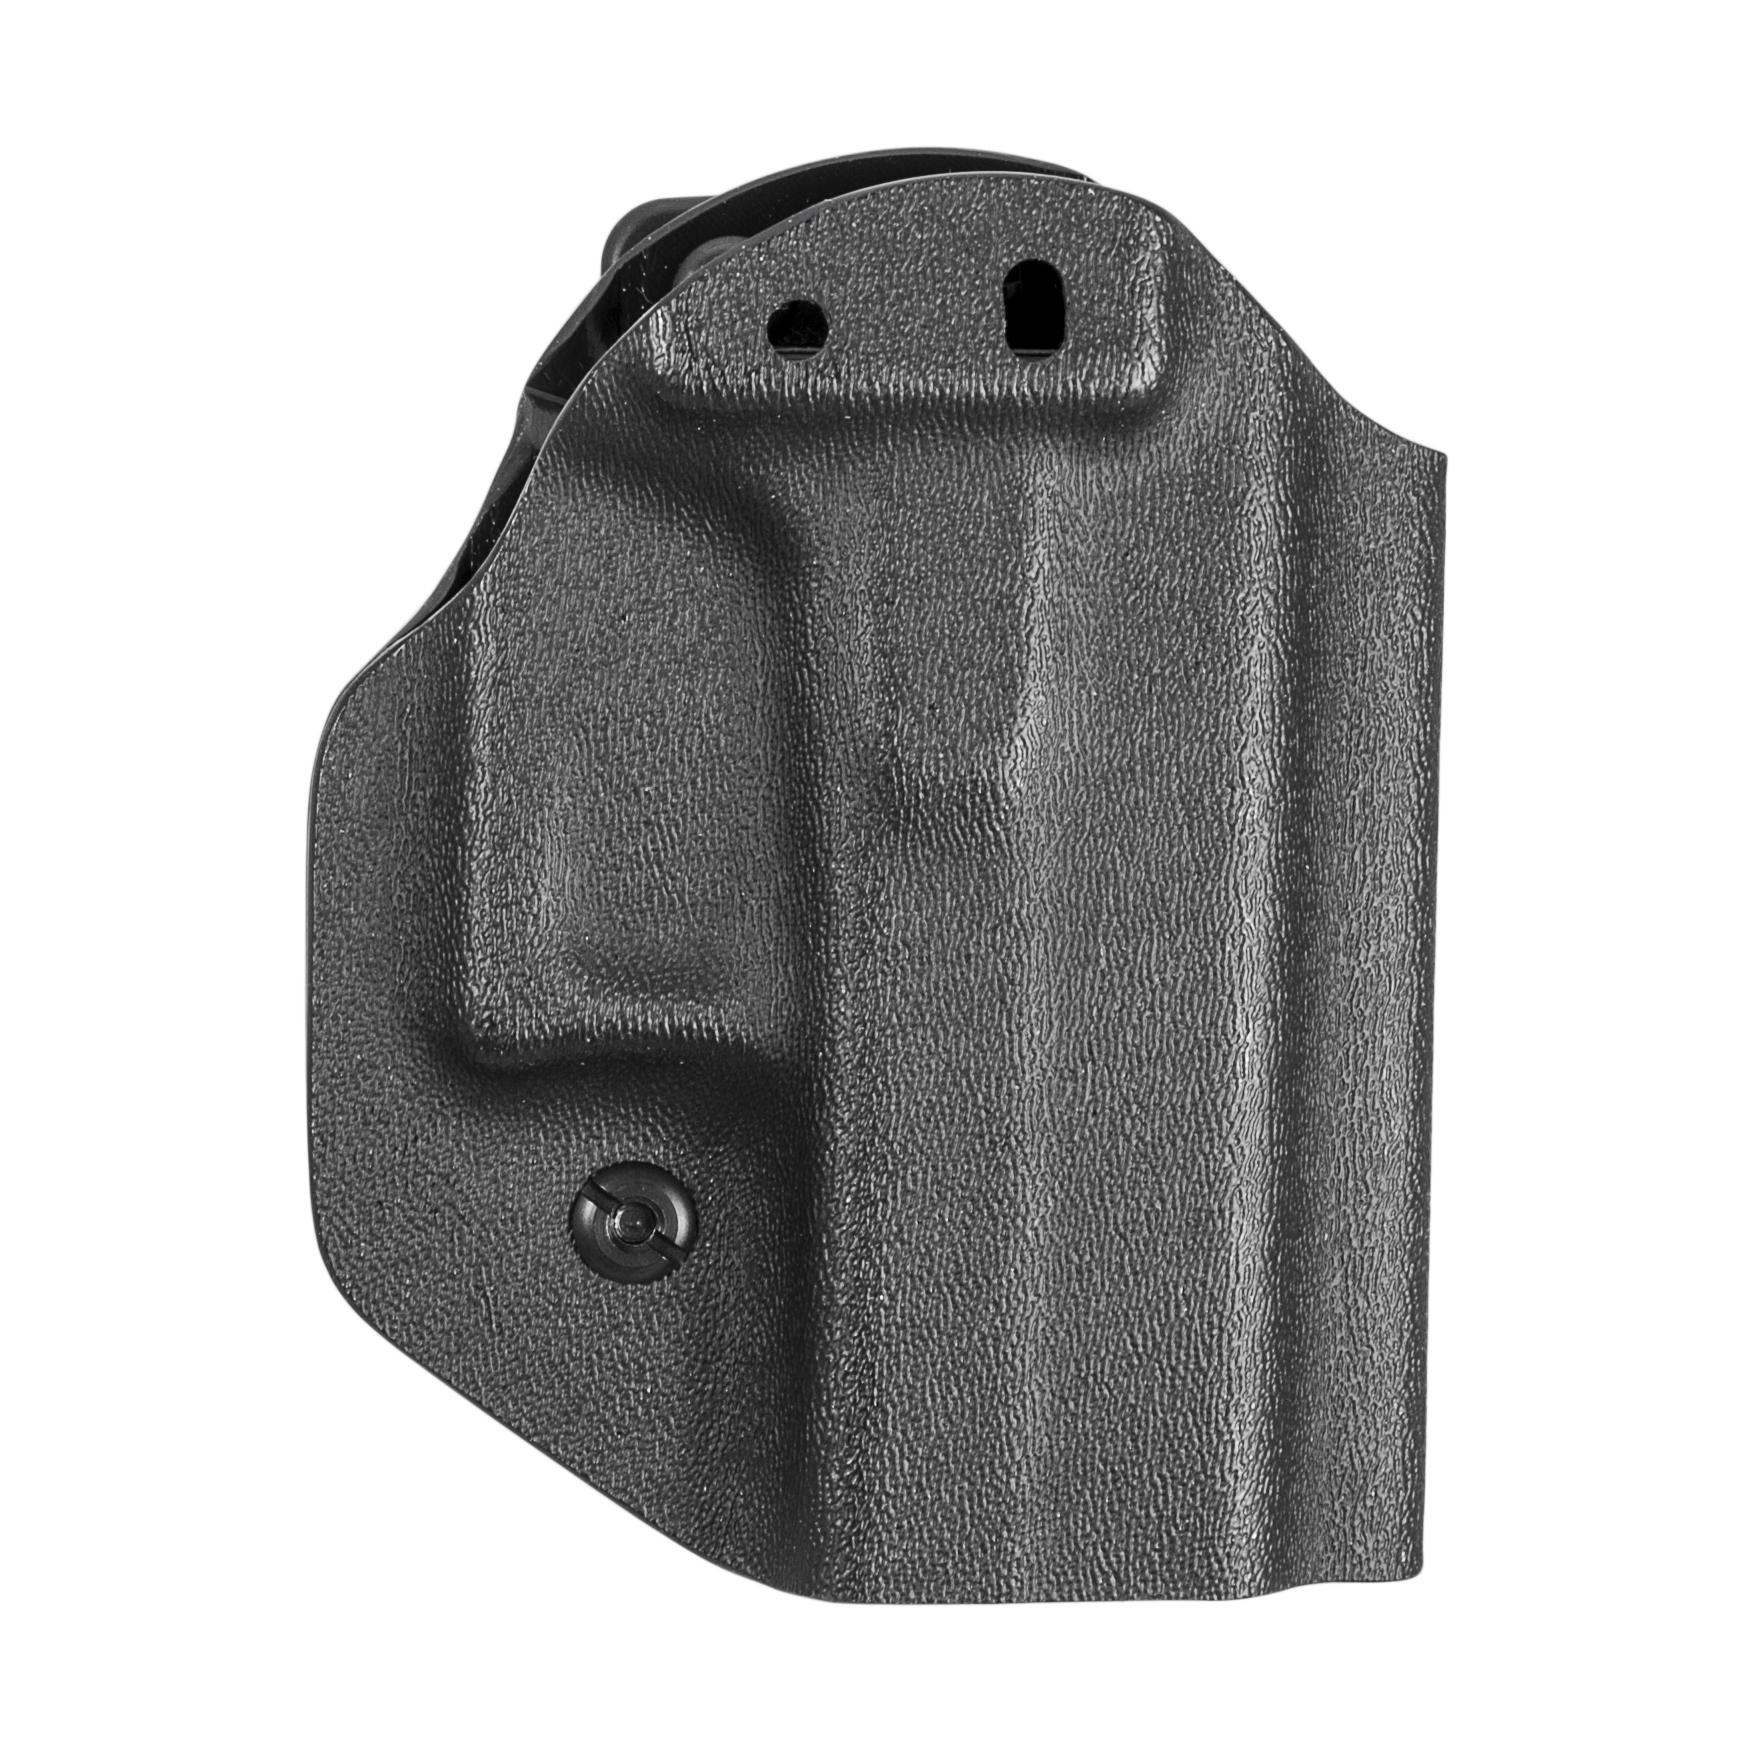 Mission First Tactical IWB Handgun Holster, Glock 43